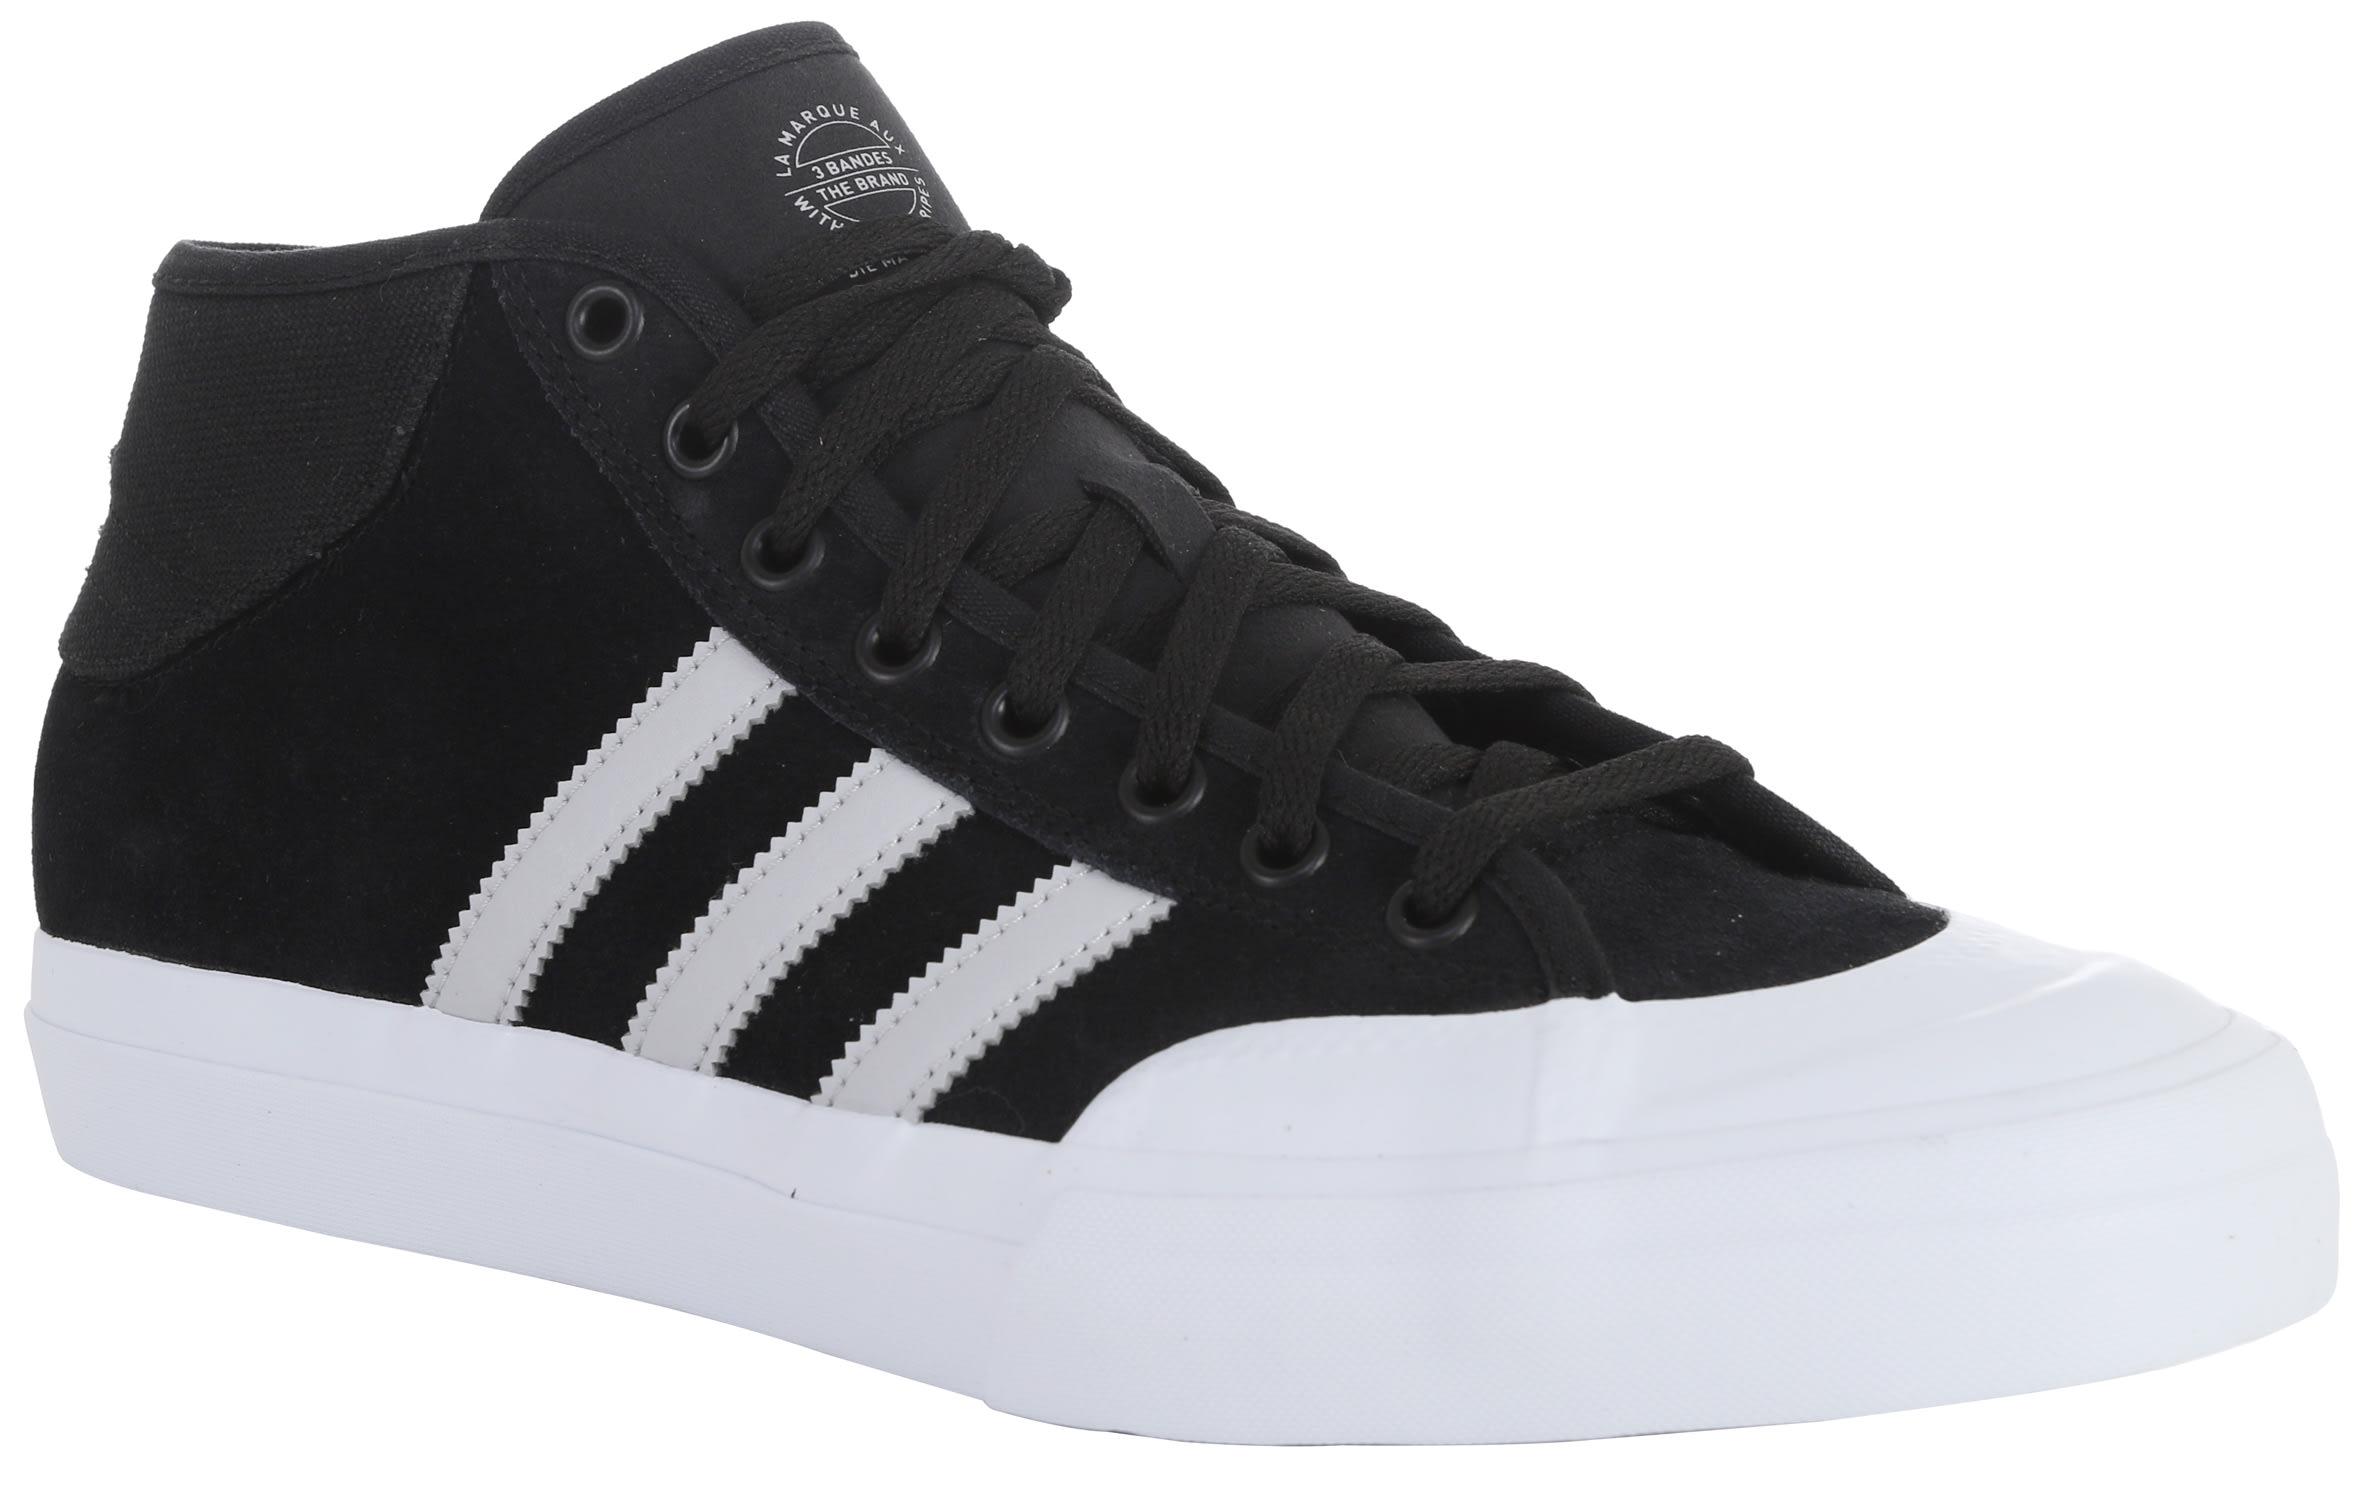 Adidas Matchcourt Mid ADV Skate Shoes